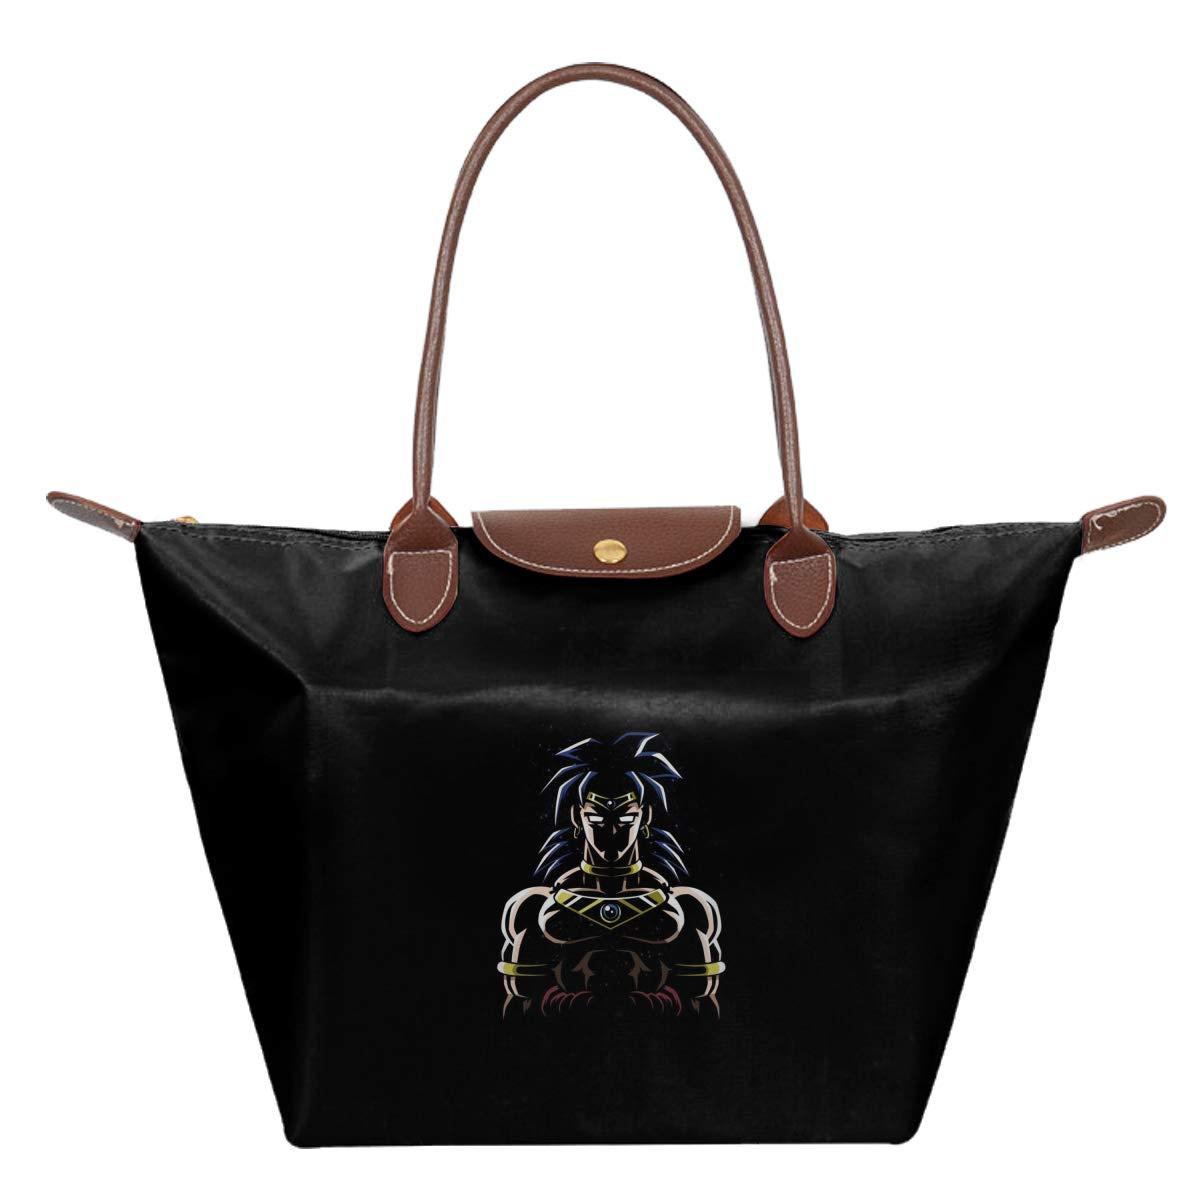 Dragon Ball Z Broly In The Shadows Waterproof Leather Folded Messenger Nylon Bag Travel Tote Hopping Folding School Handbags